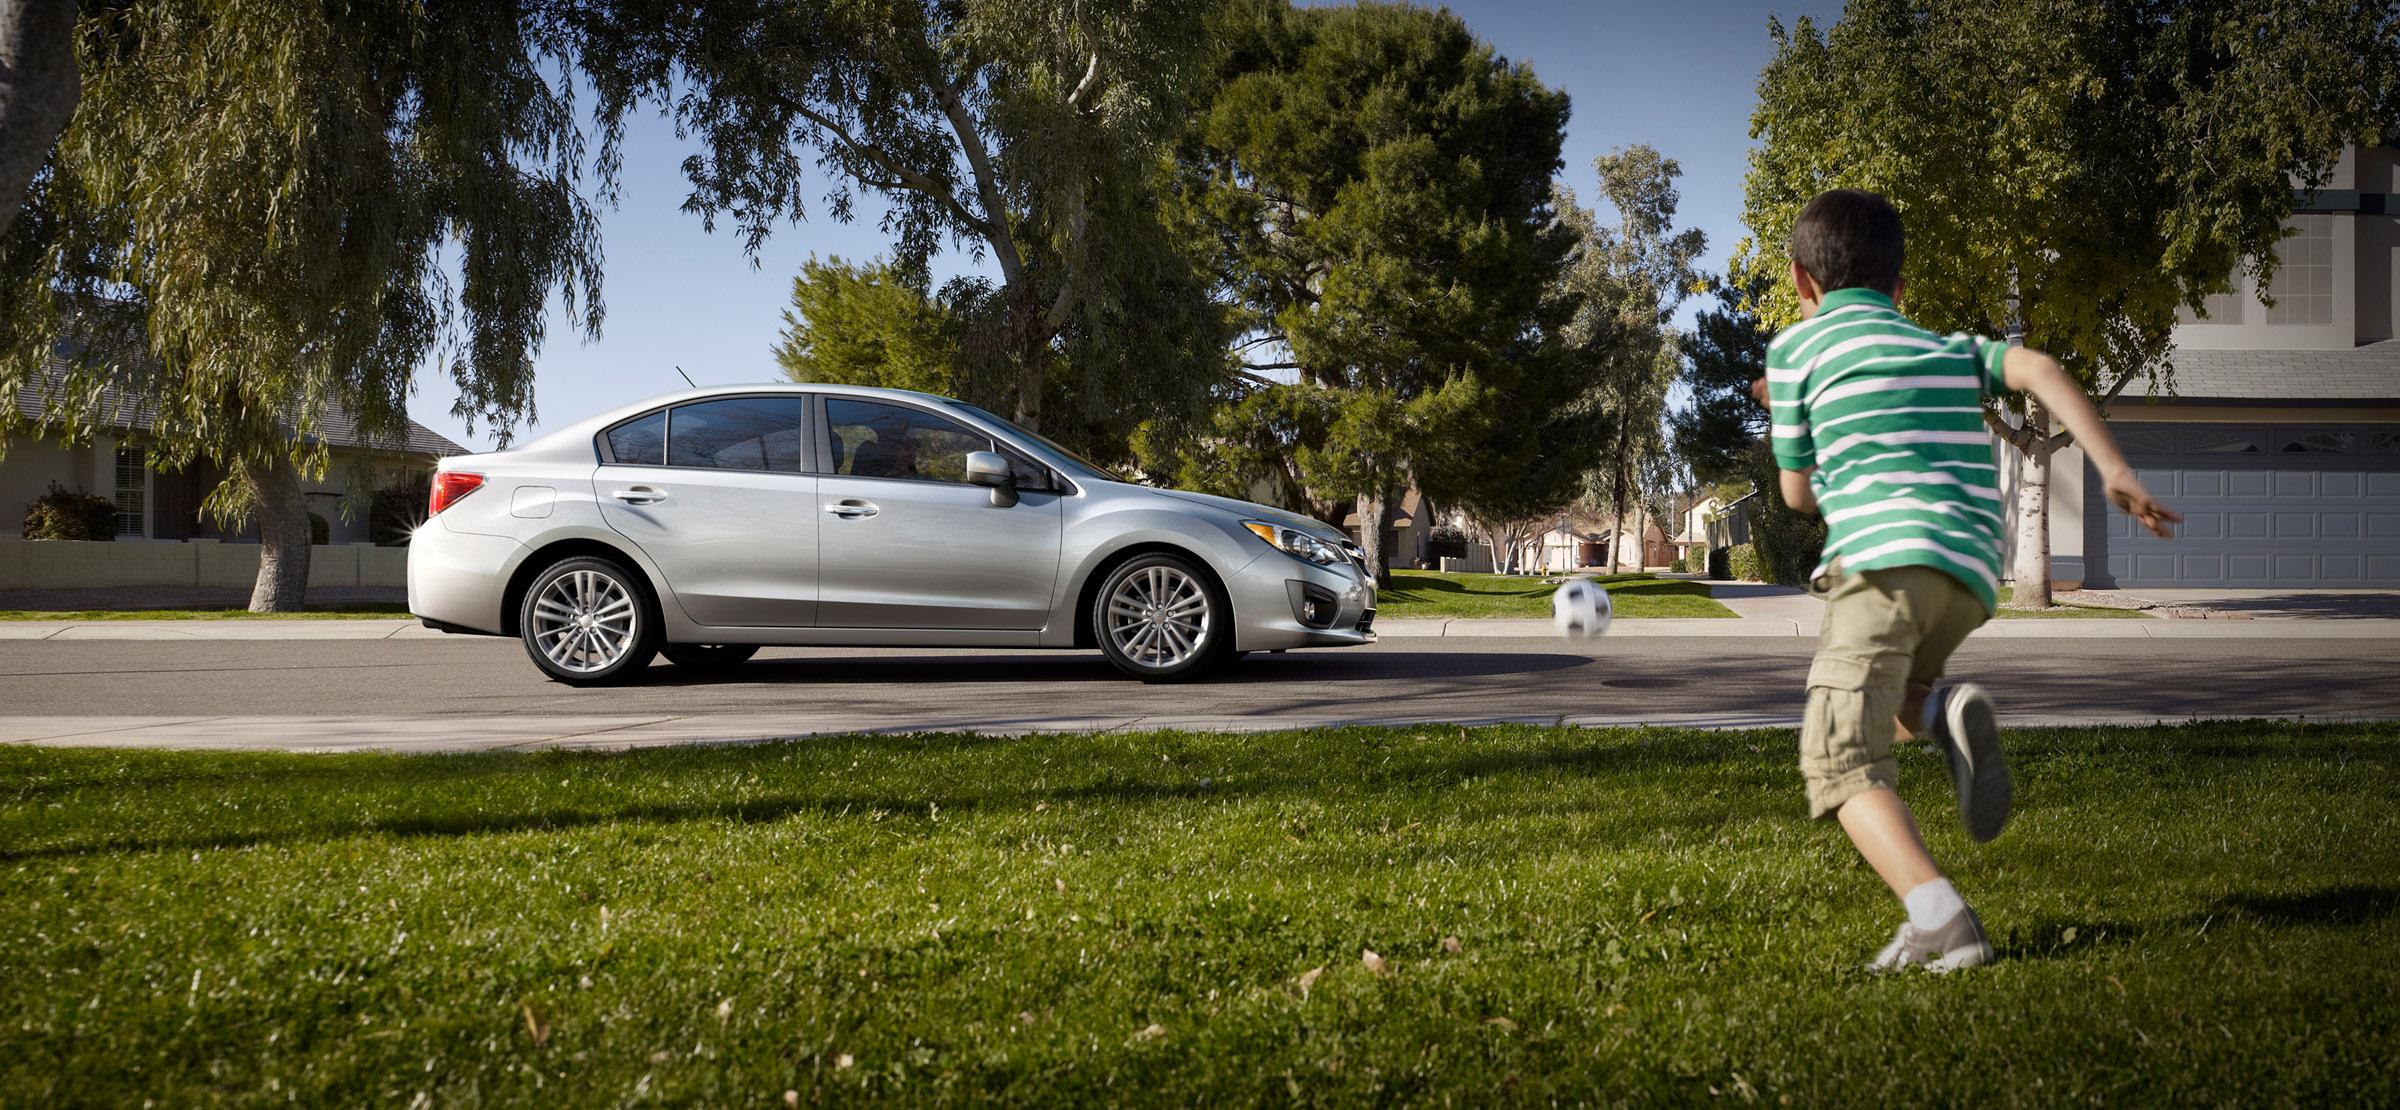 2012 - Subaru Impreza 2-0i лимитированная четвертая версия (фотографии) - фотография №3